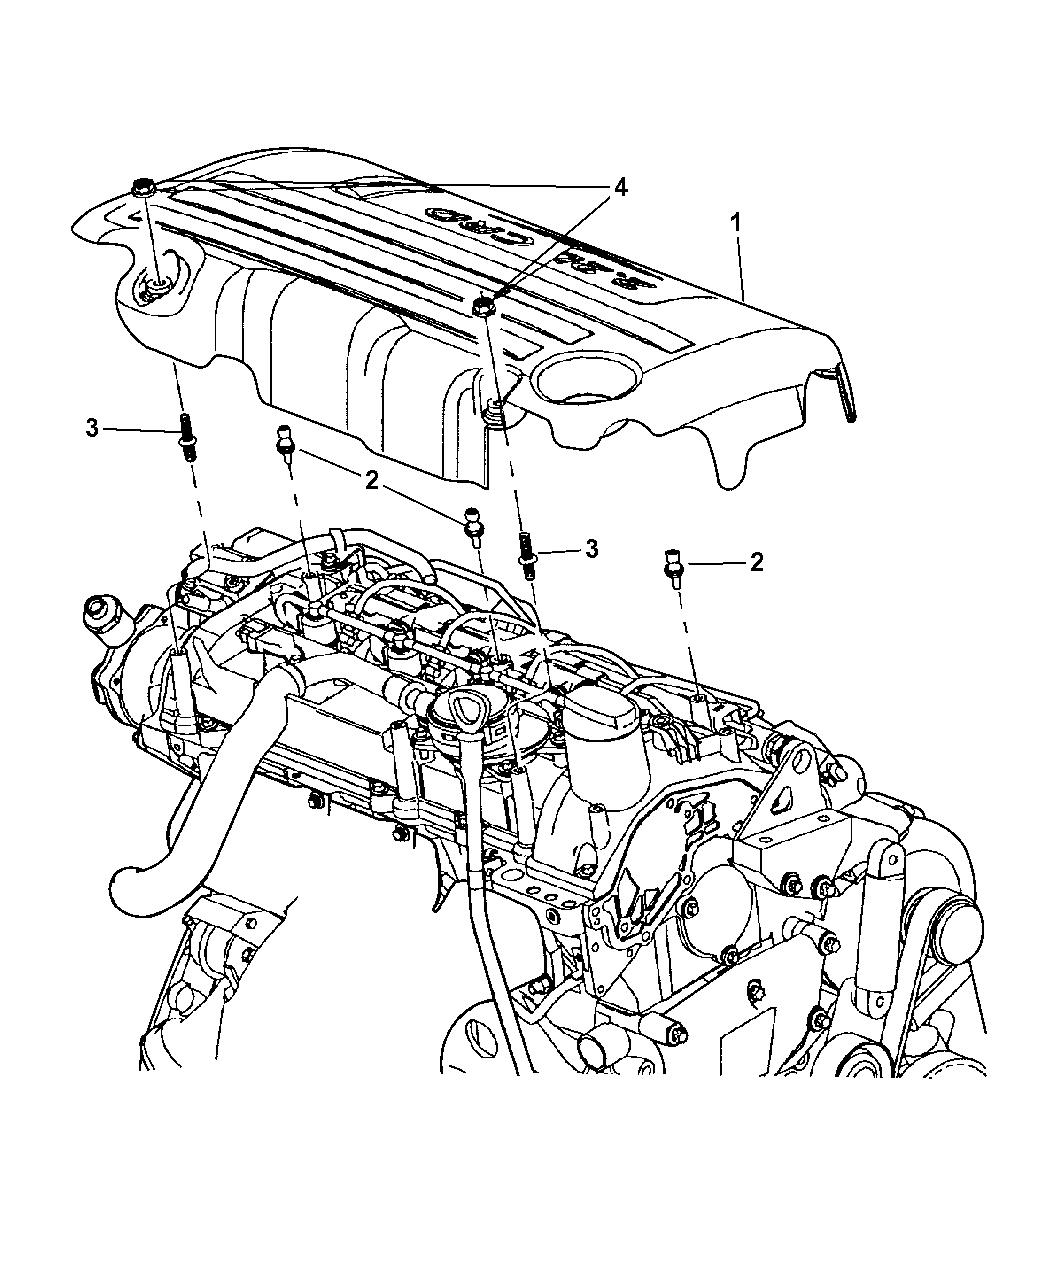 2003 chrysler pt cruiser cover engine mopar parts giant rh moparpartsgiant com 2003 chrysler pt cruiser parts diagram 2003 pt cruiser repair manual pdf